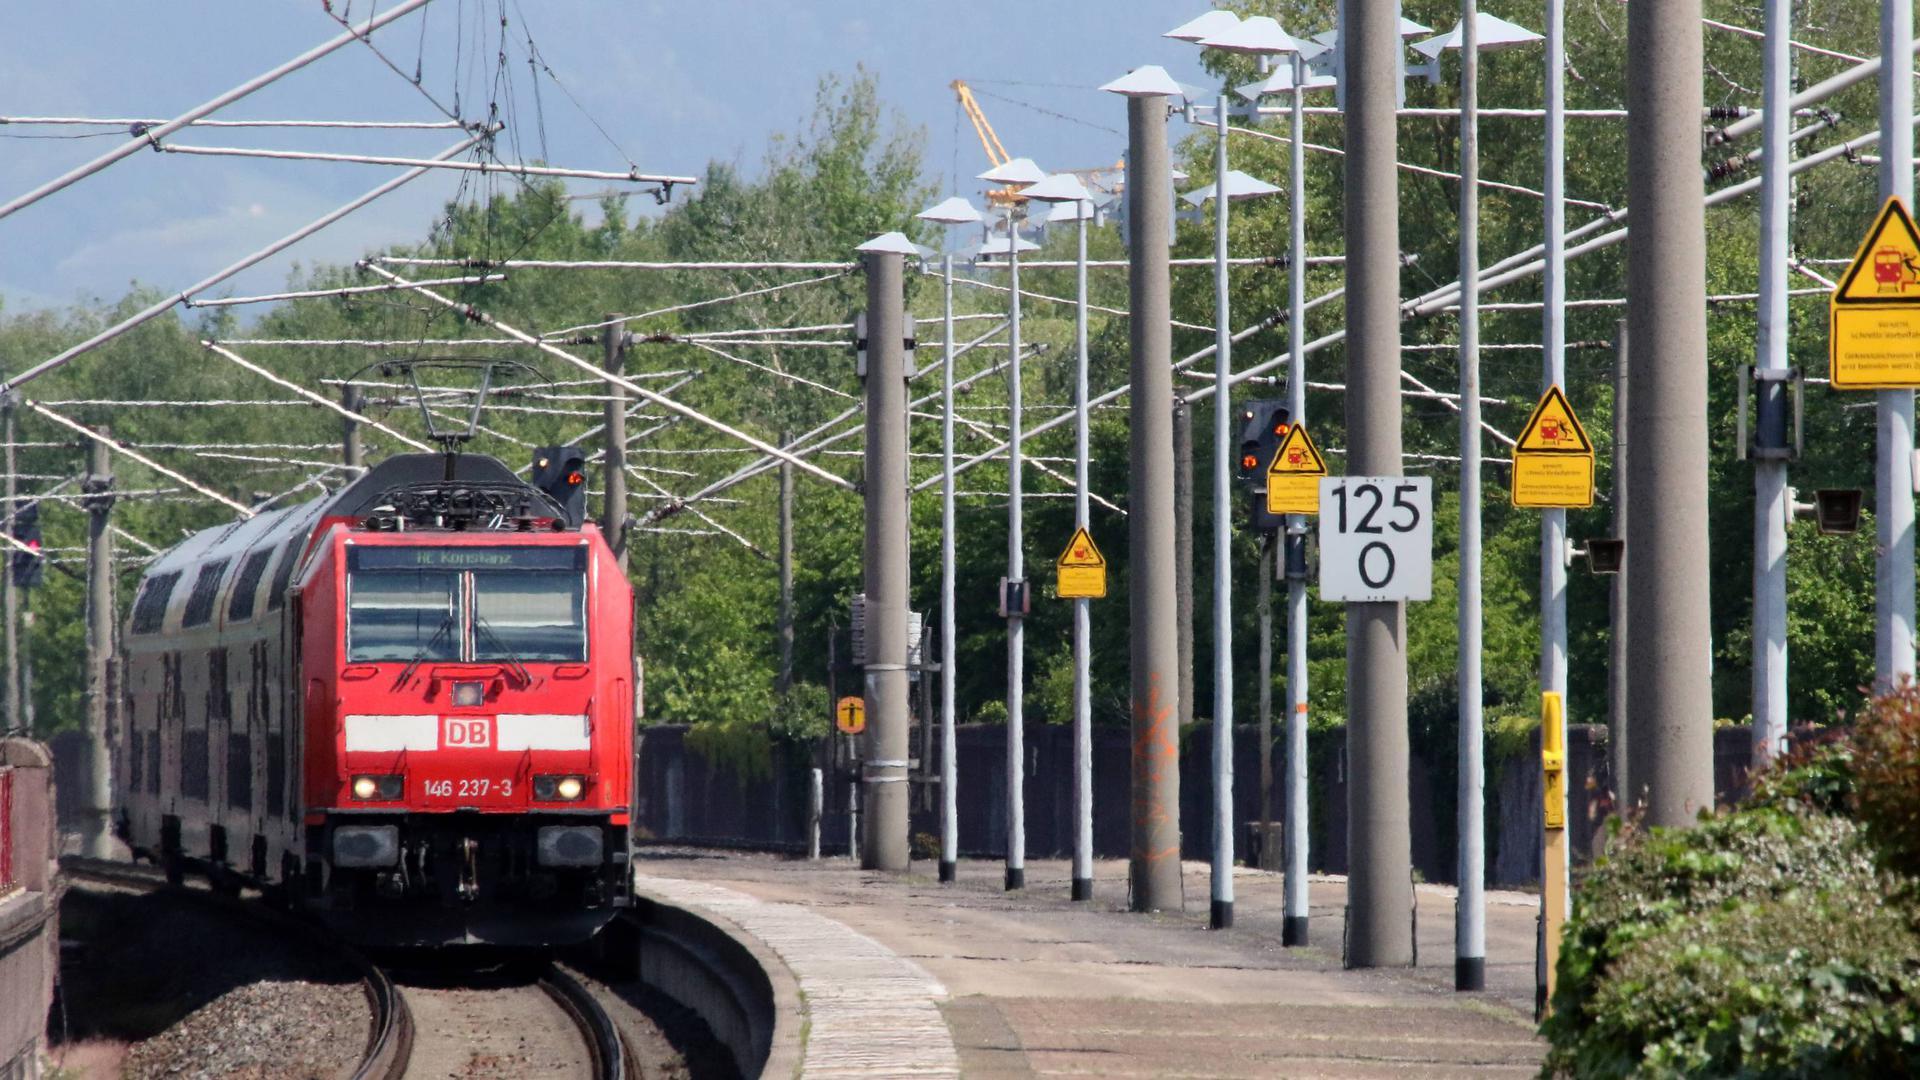 Bahnhof Achern Stadtbahn DB Regio Anschluss Klinik